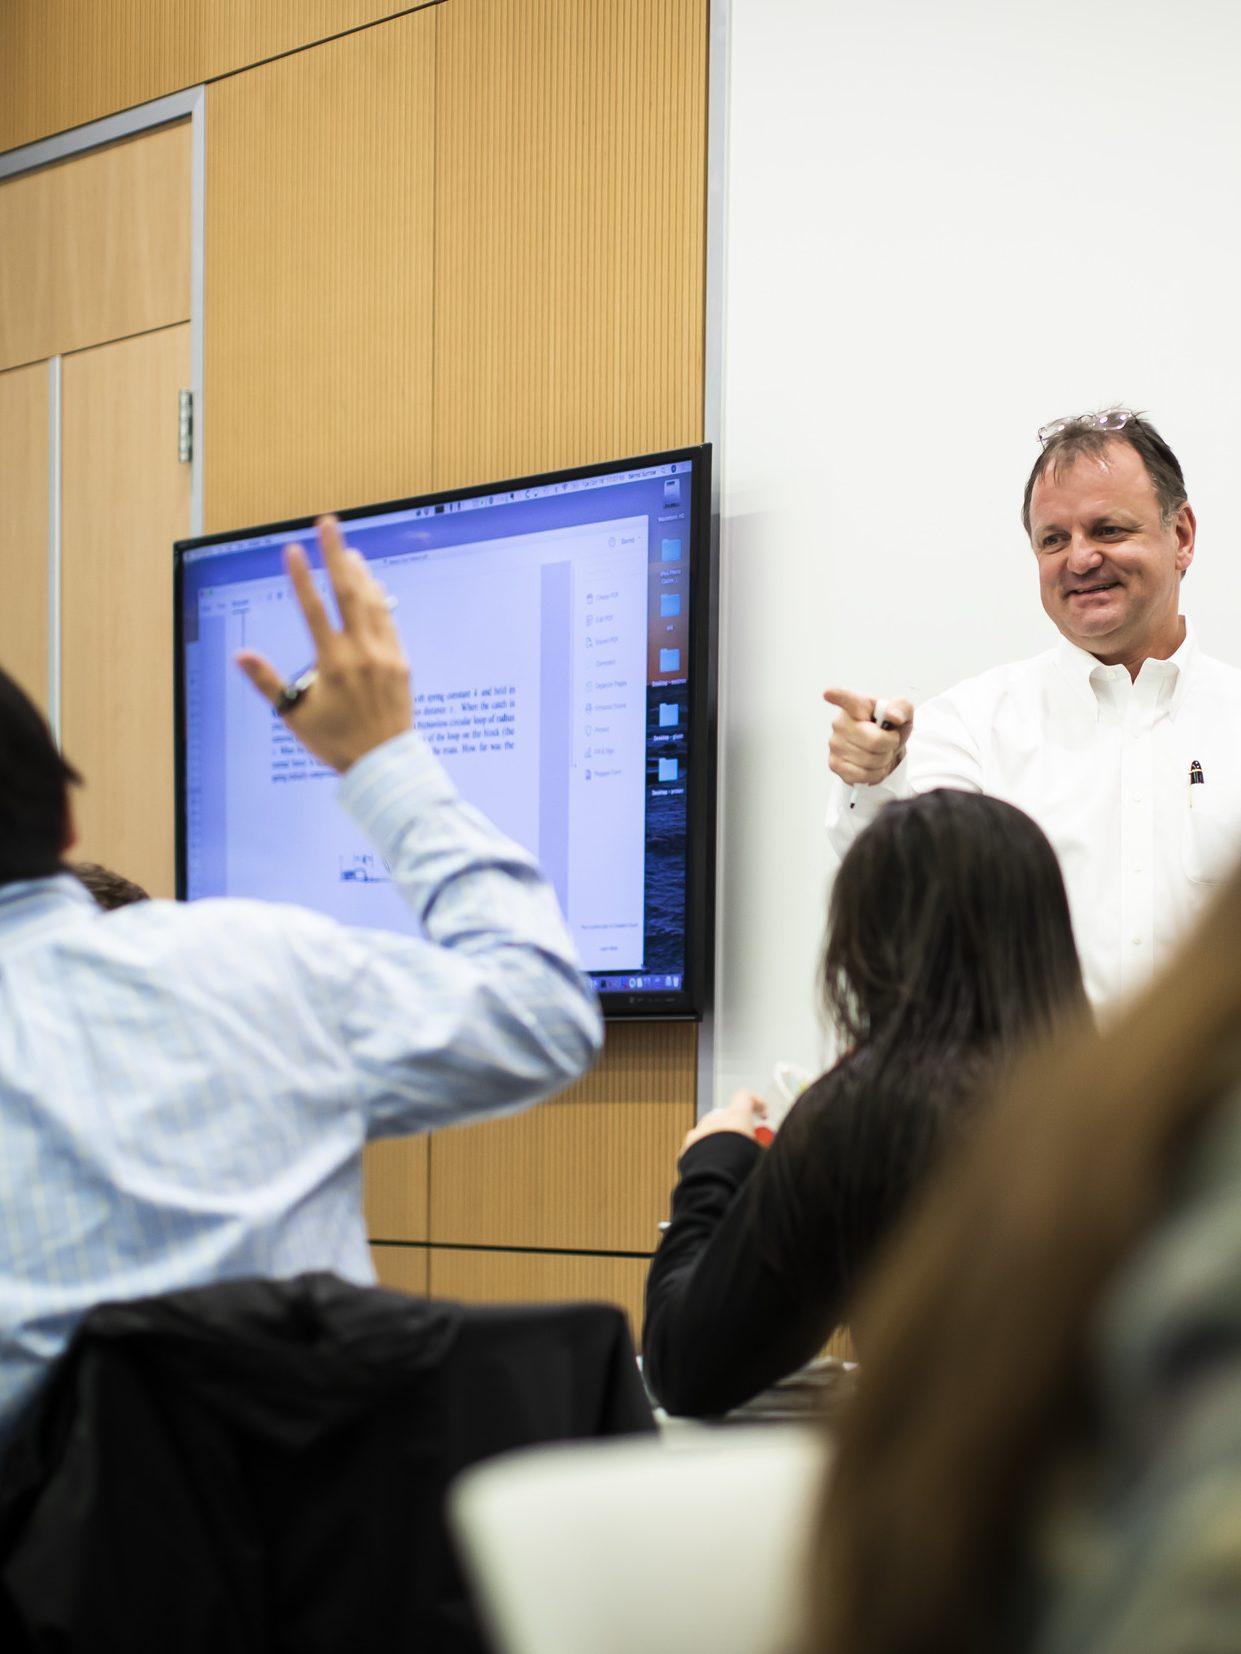 Professor Bernd Surrow conducting class in a SERC classroom